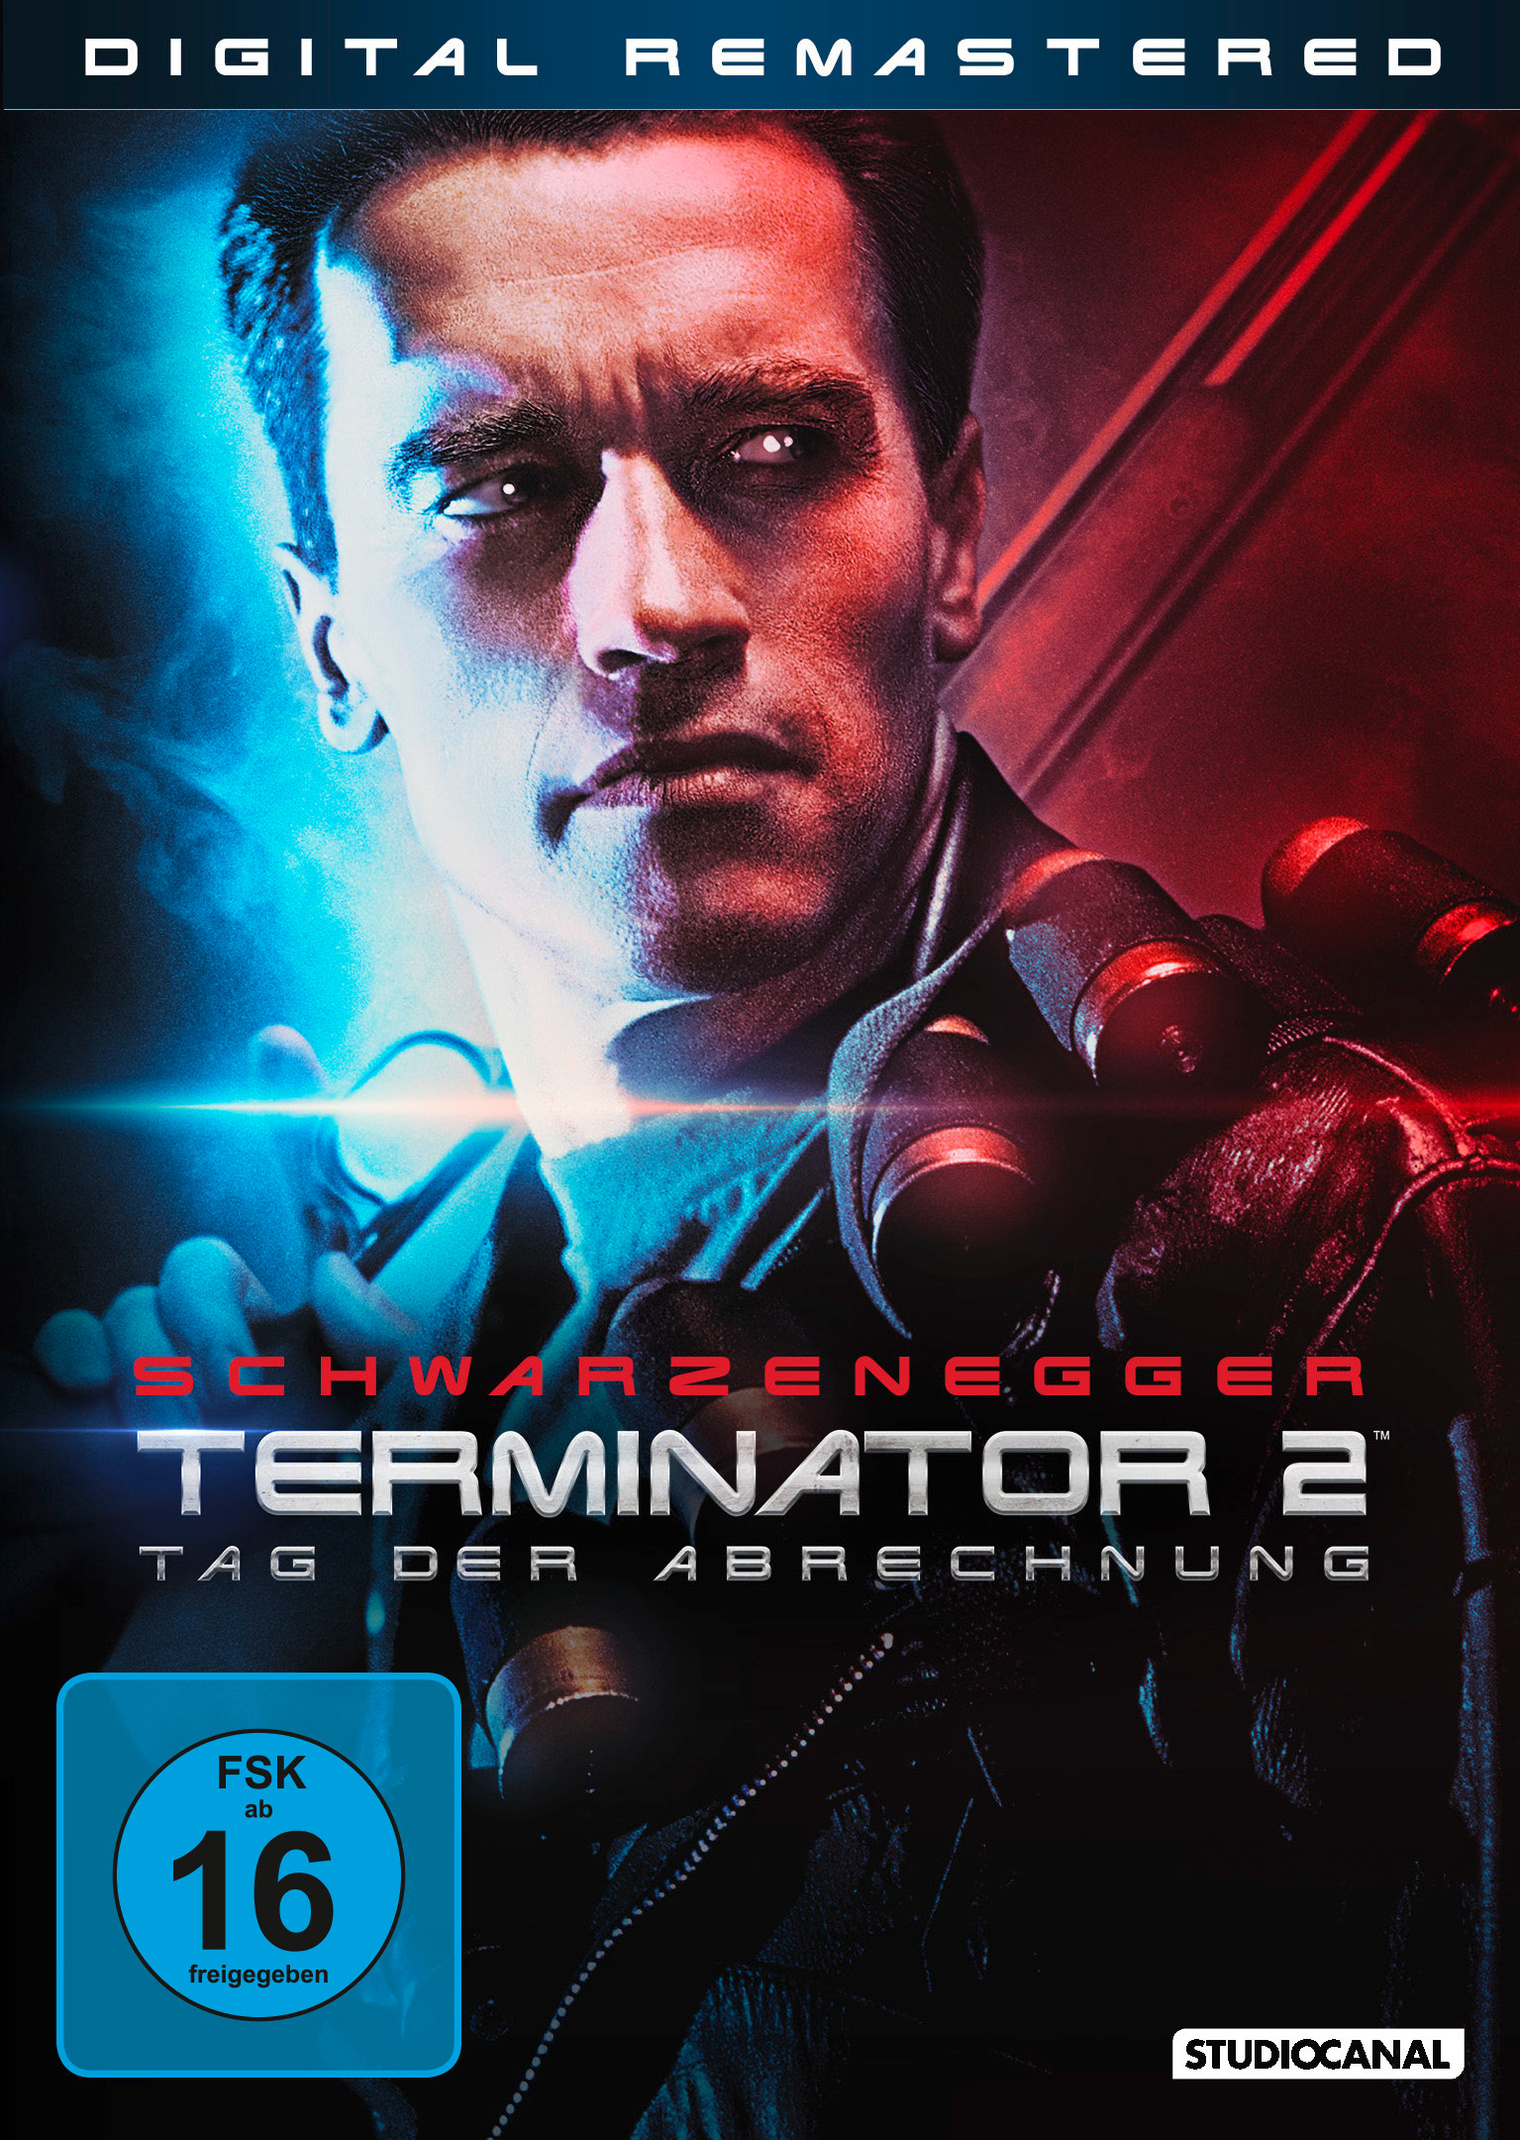 Terminator 2 DVD jetzt bei Weltbild.de online bestellen